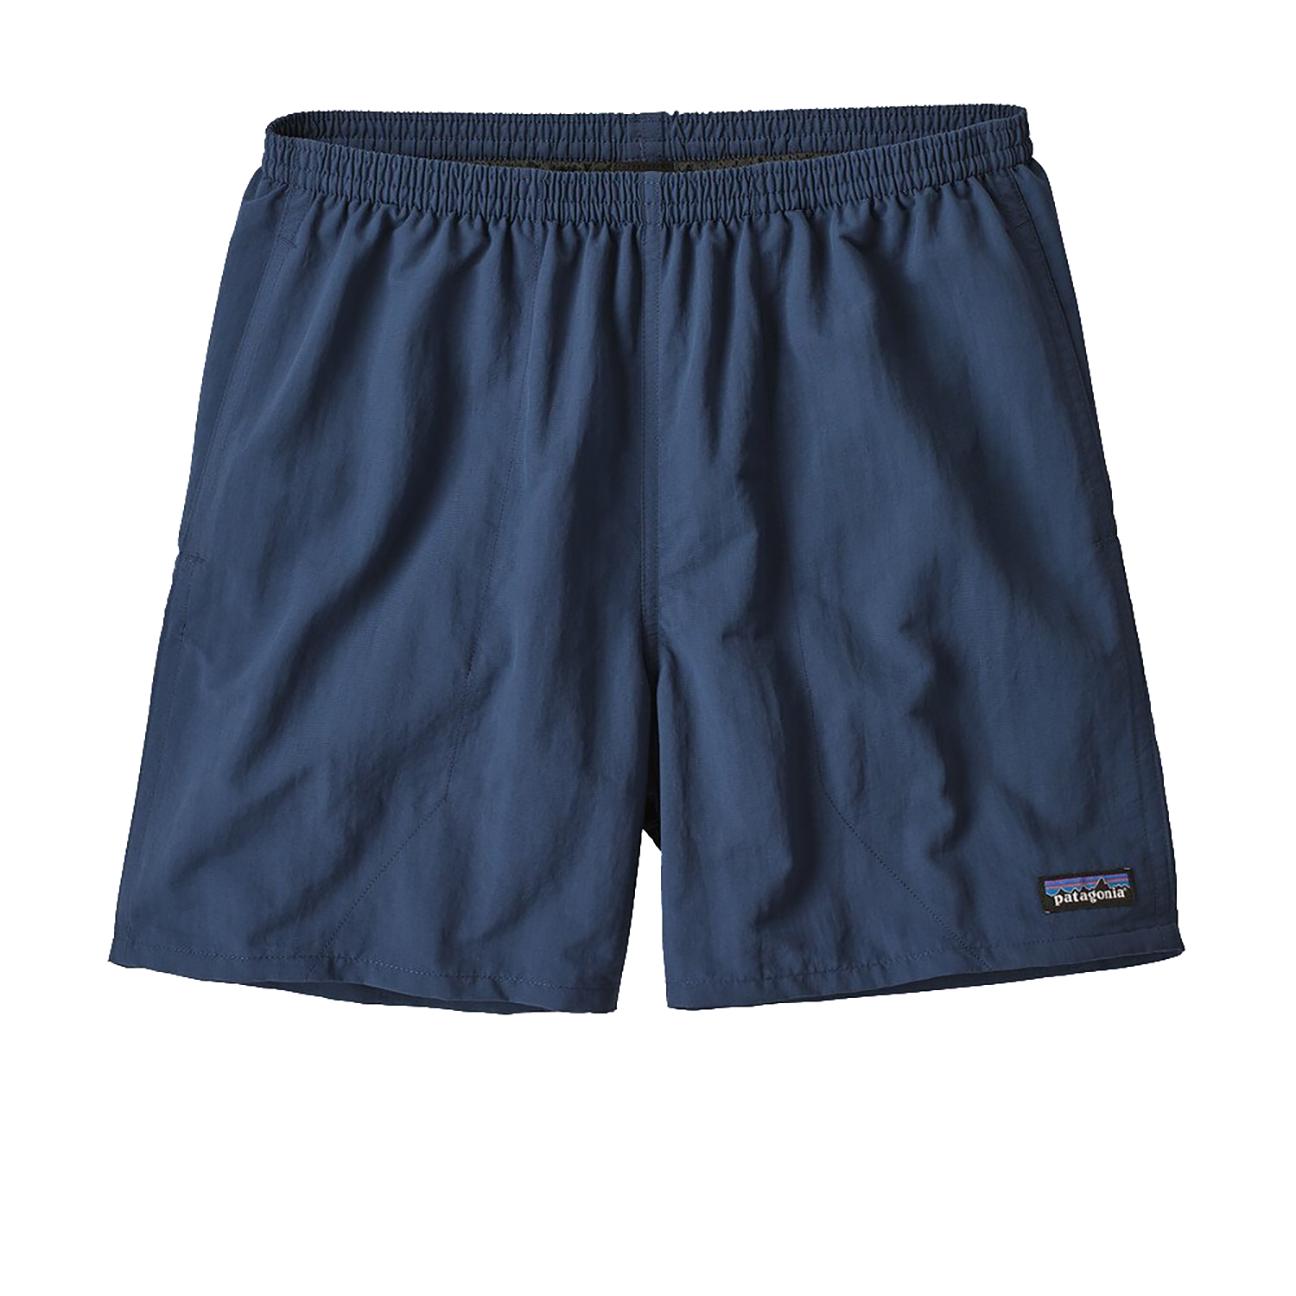 "Men's Baggies Shorts - 5"" Stone Blue-1"